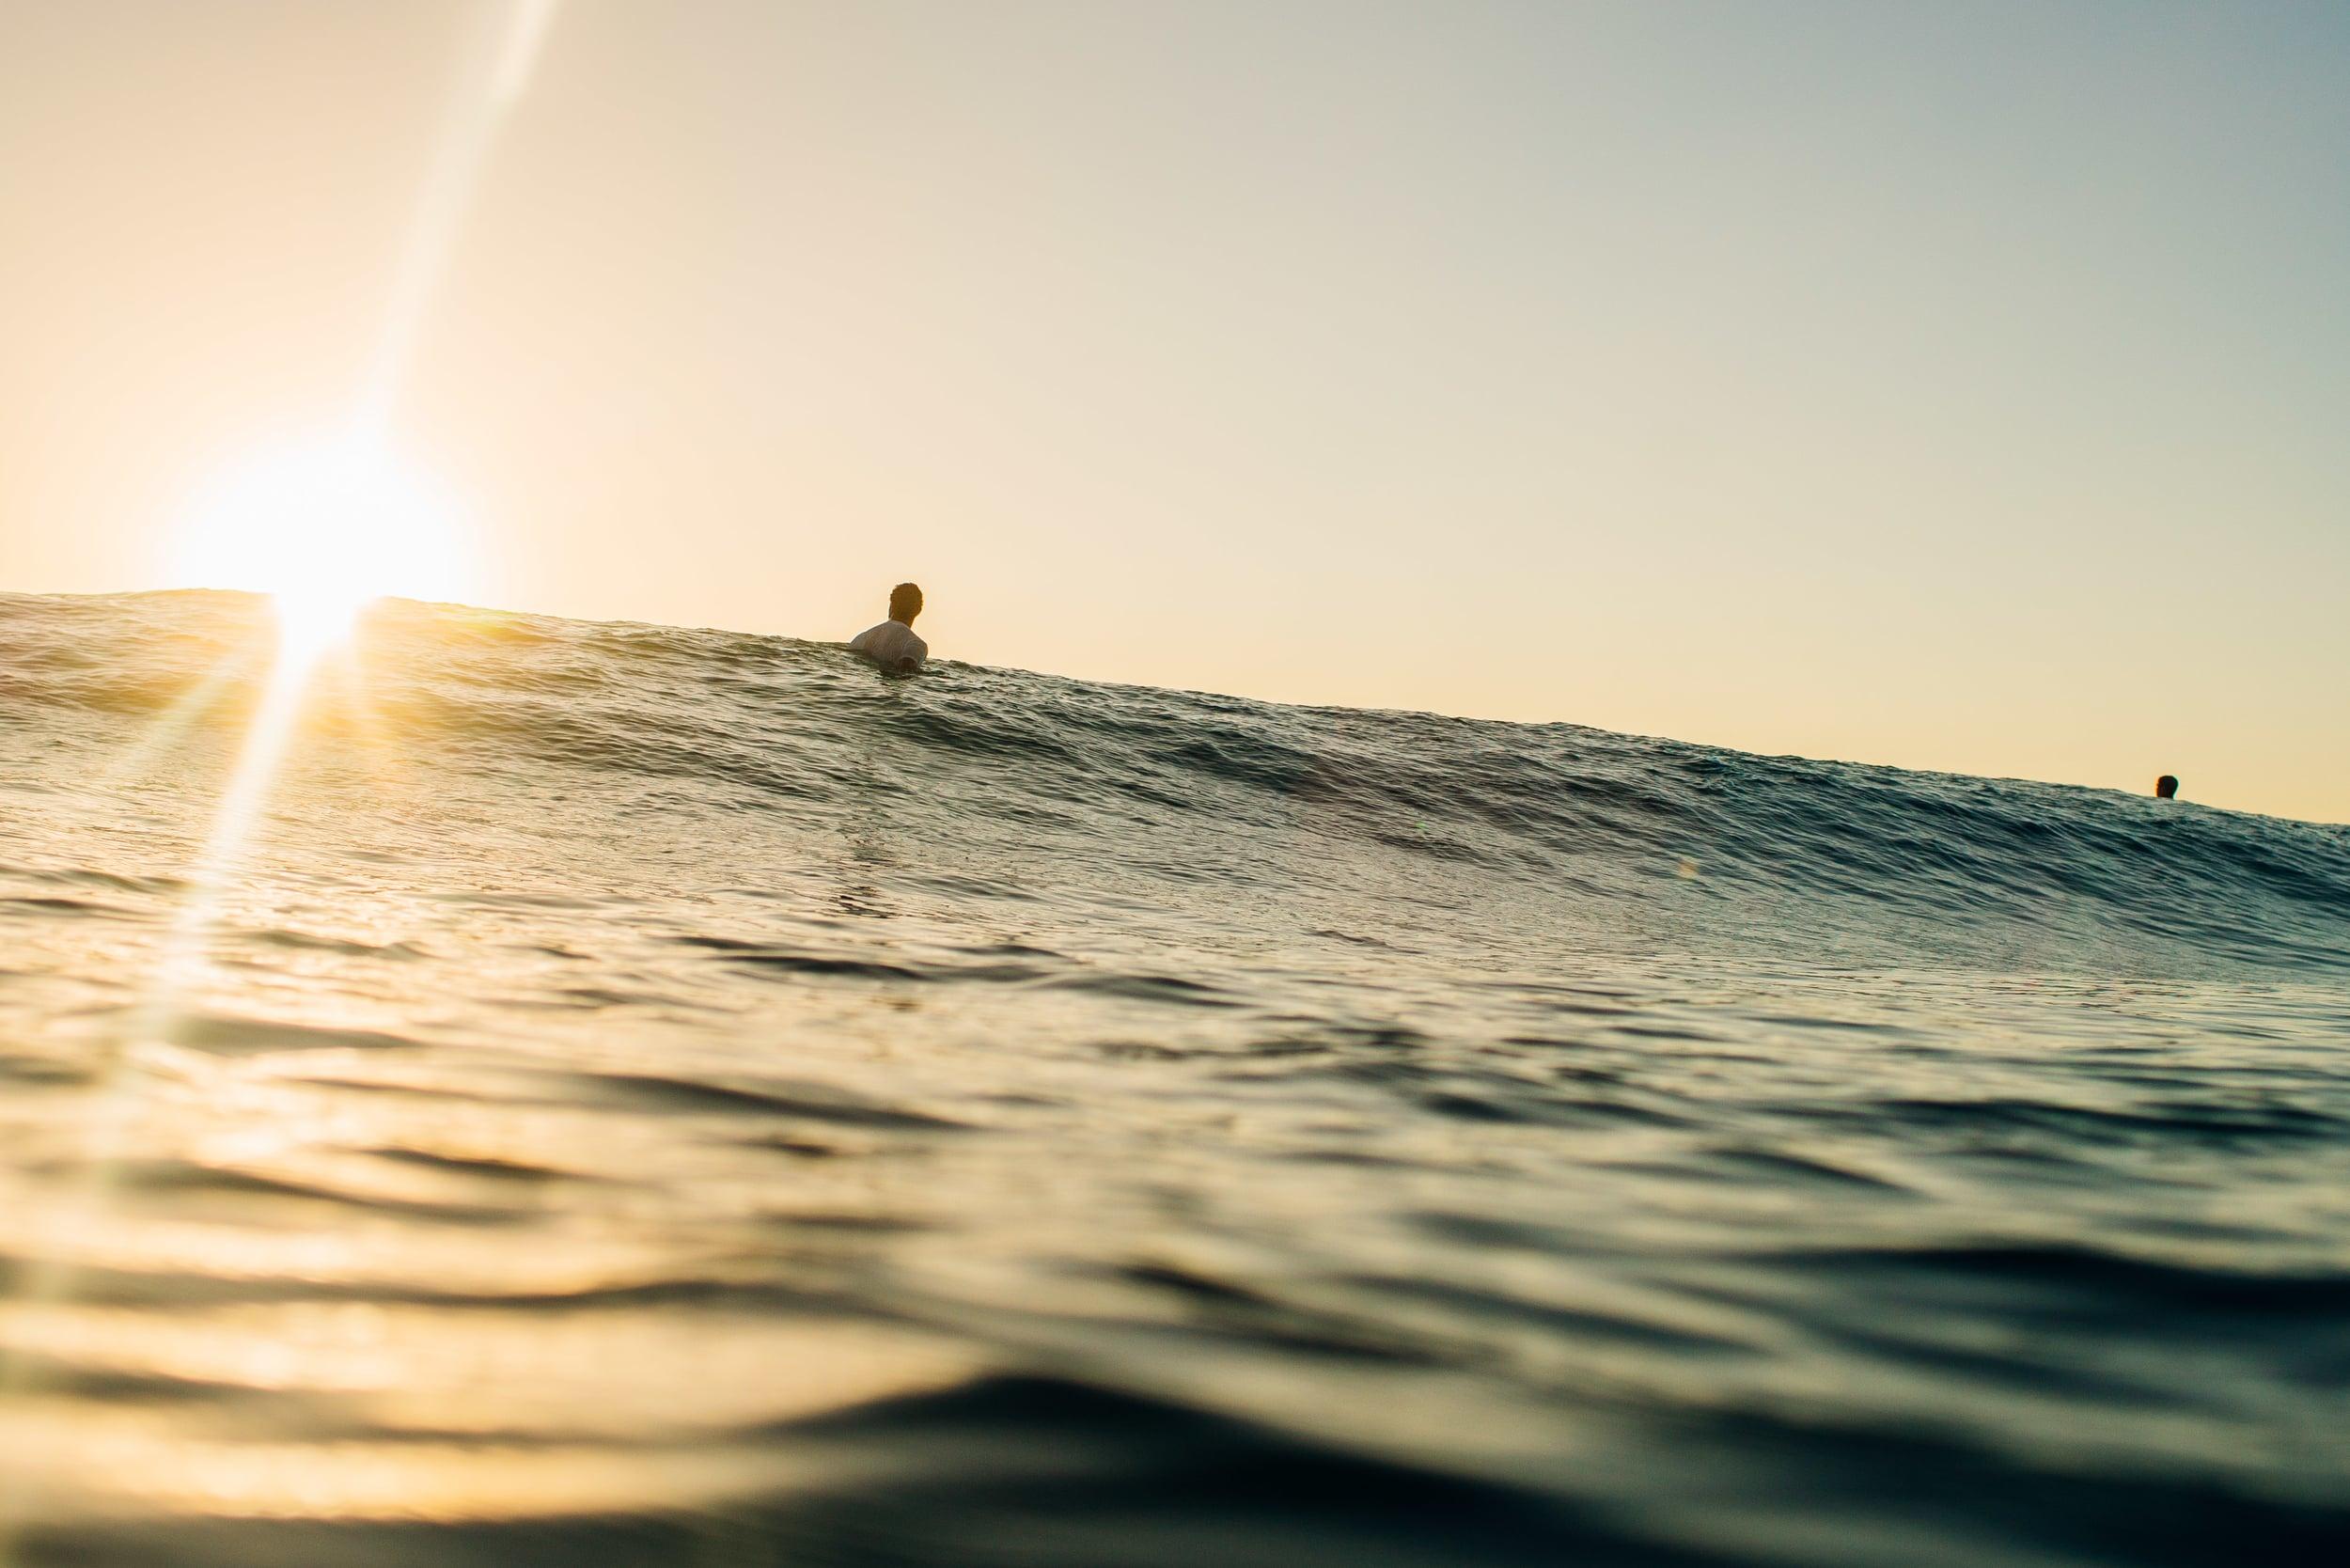 bryce-johnson-photography-kauai-hawaii-surfing-a7rii-aquatech-water-ocean-2.jpg